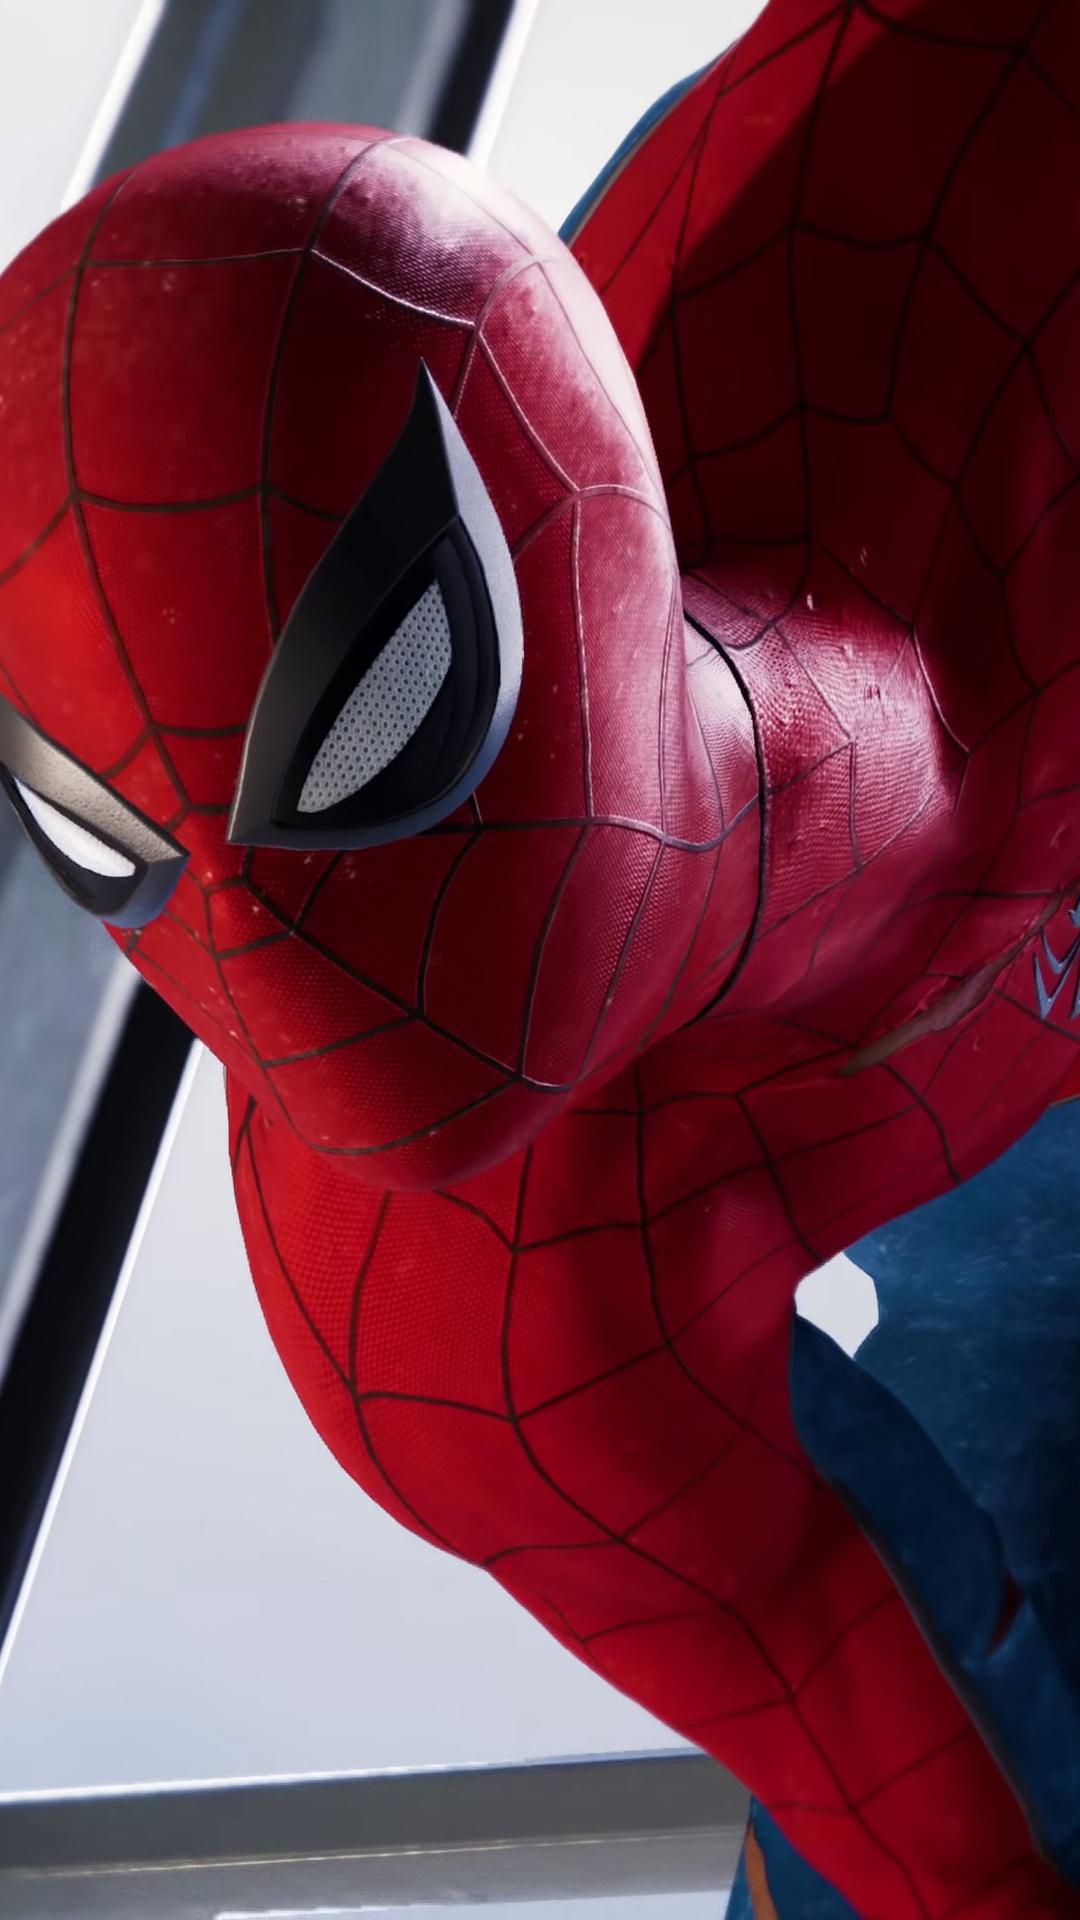 1080x1920 Spiderman Ps4 2018 4k Iphone 7,6s,6 Plus, Pixel ...